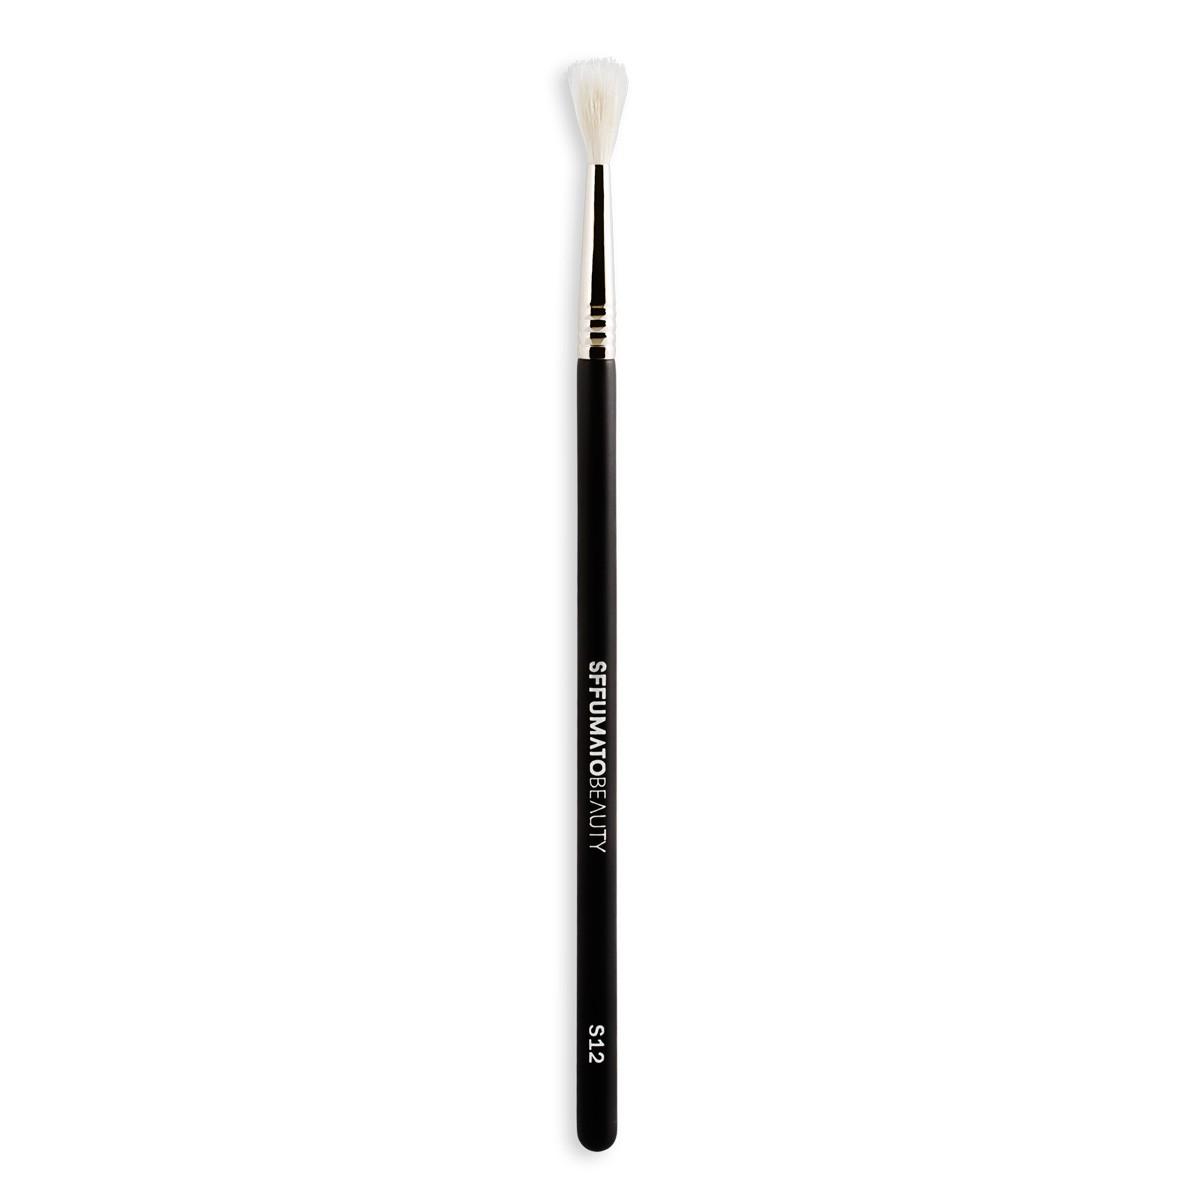 S12 - Pincel Pequeno Para Esfumar Profissional Sffumato Beauty